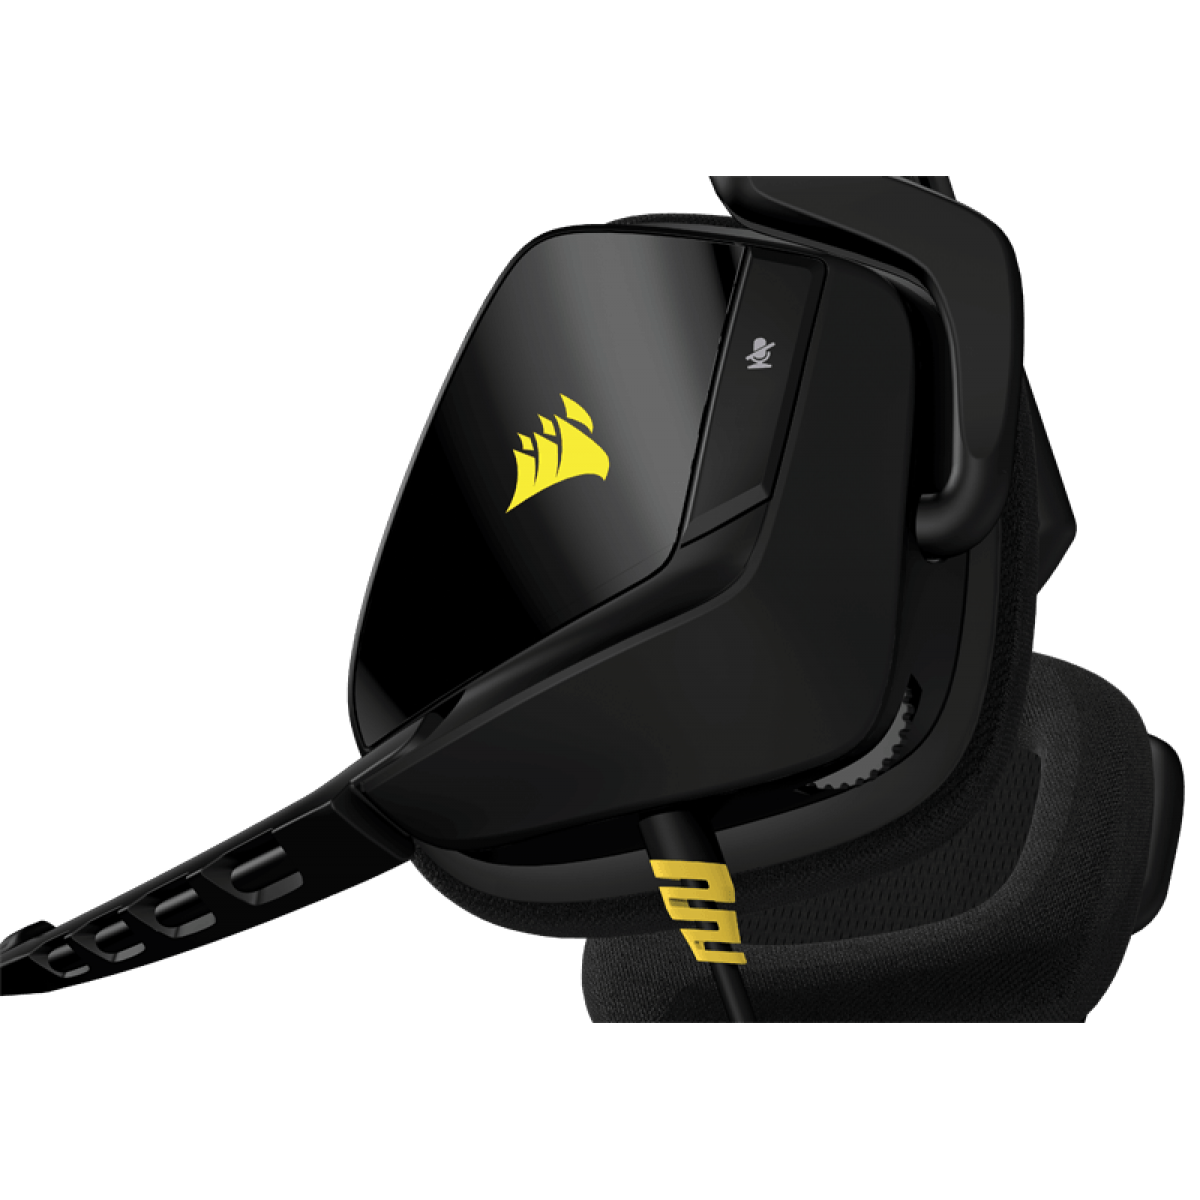 Headset Gamer Corsair Void 2.0 Stereo Yellow/Black CA-9011131-NA